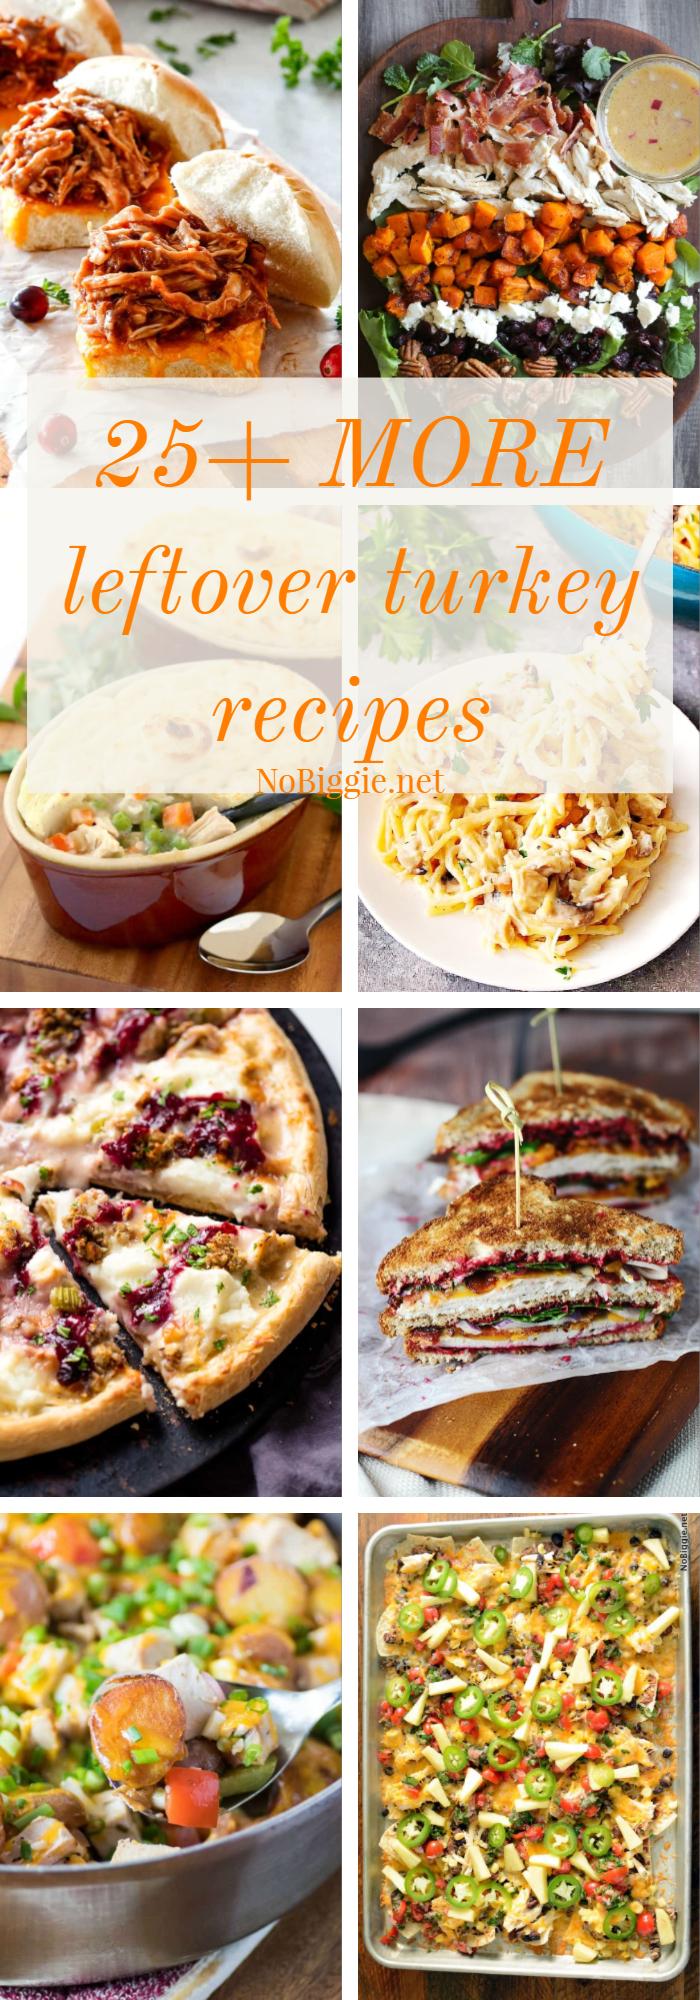 25+ MORE leftover turkey recipes | NoBiggie.net